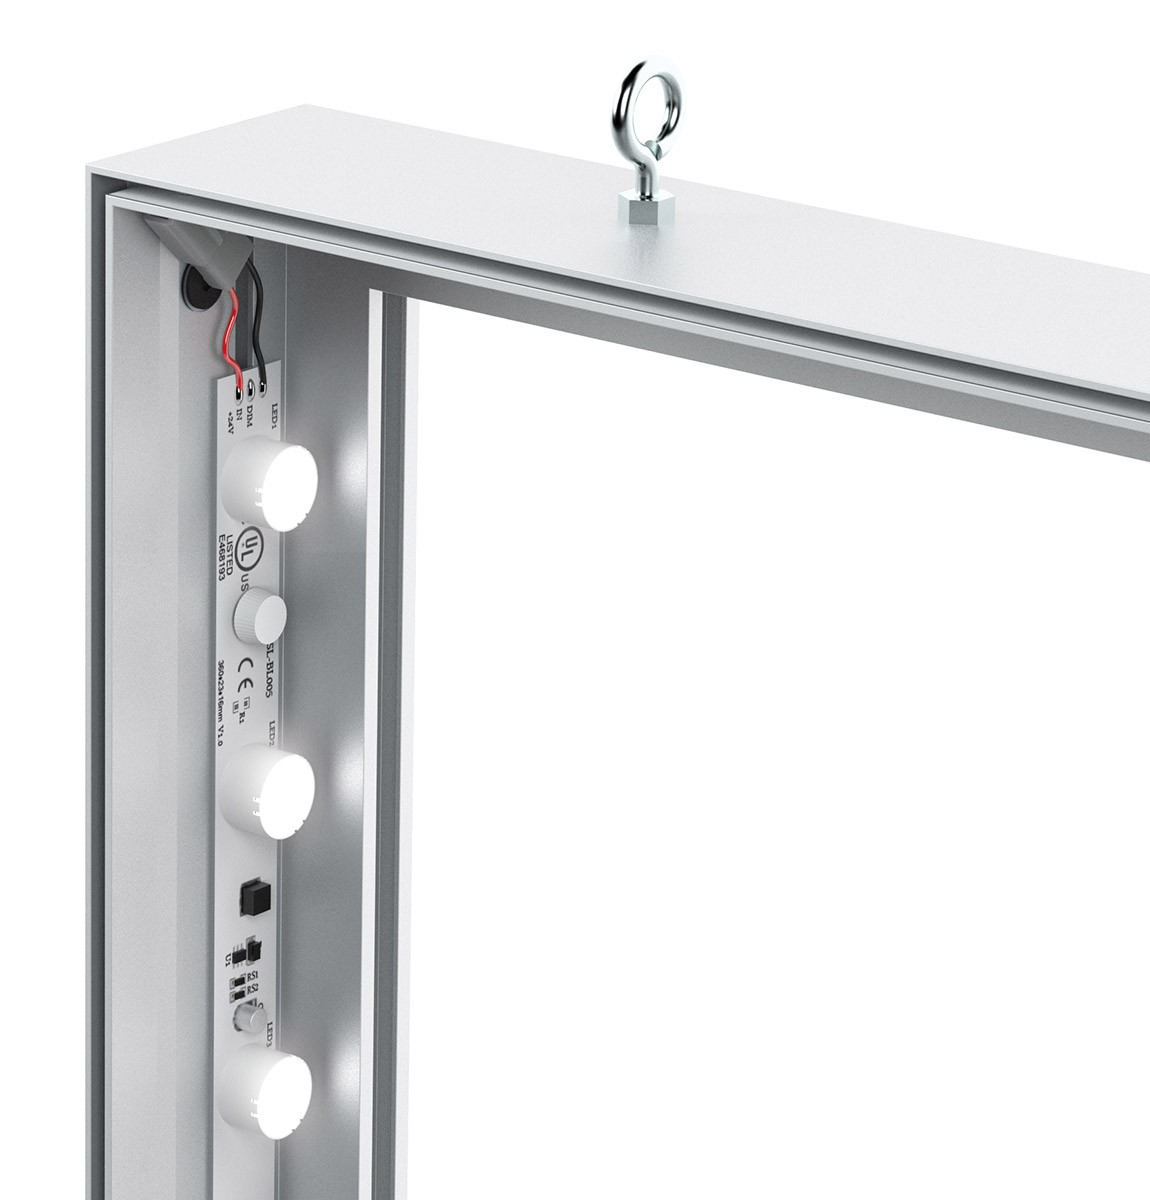 Charisma 36x48 Slim LED SEG Fabric Light Box